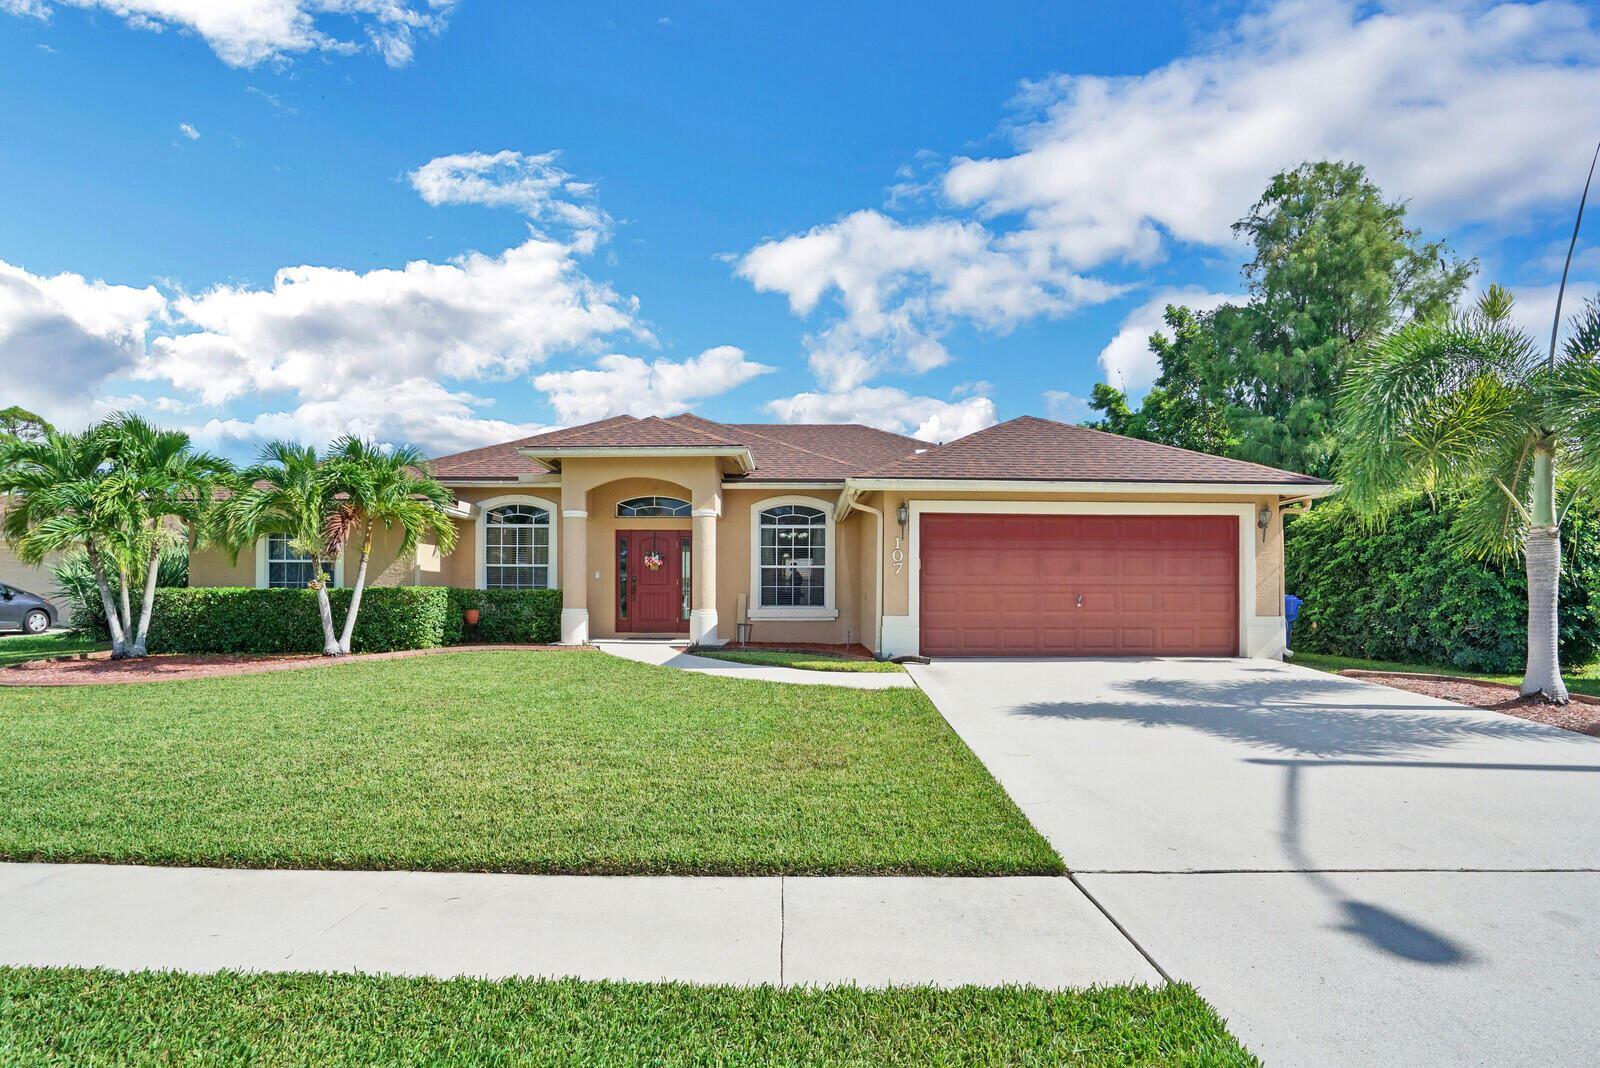 Photo of 107 Sycamore Drive, Royal Palm Beach, FL 33411 (MLS # RX-10736201)